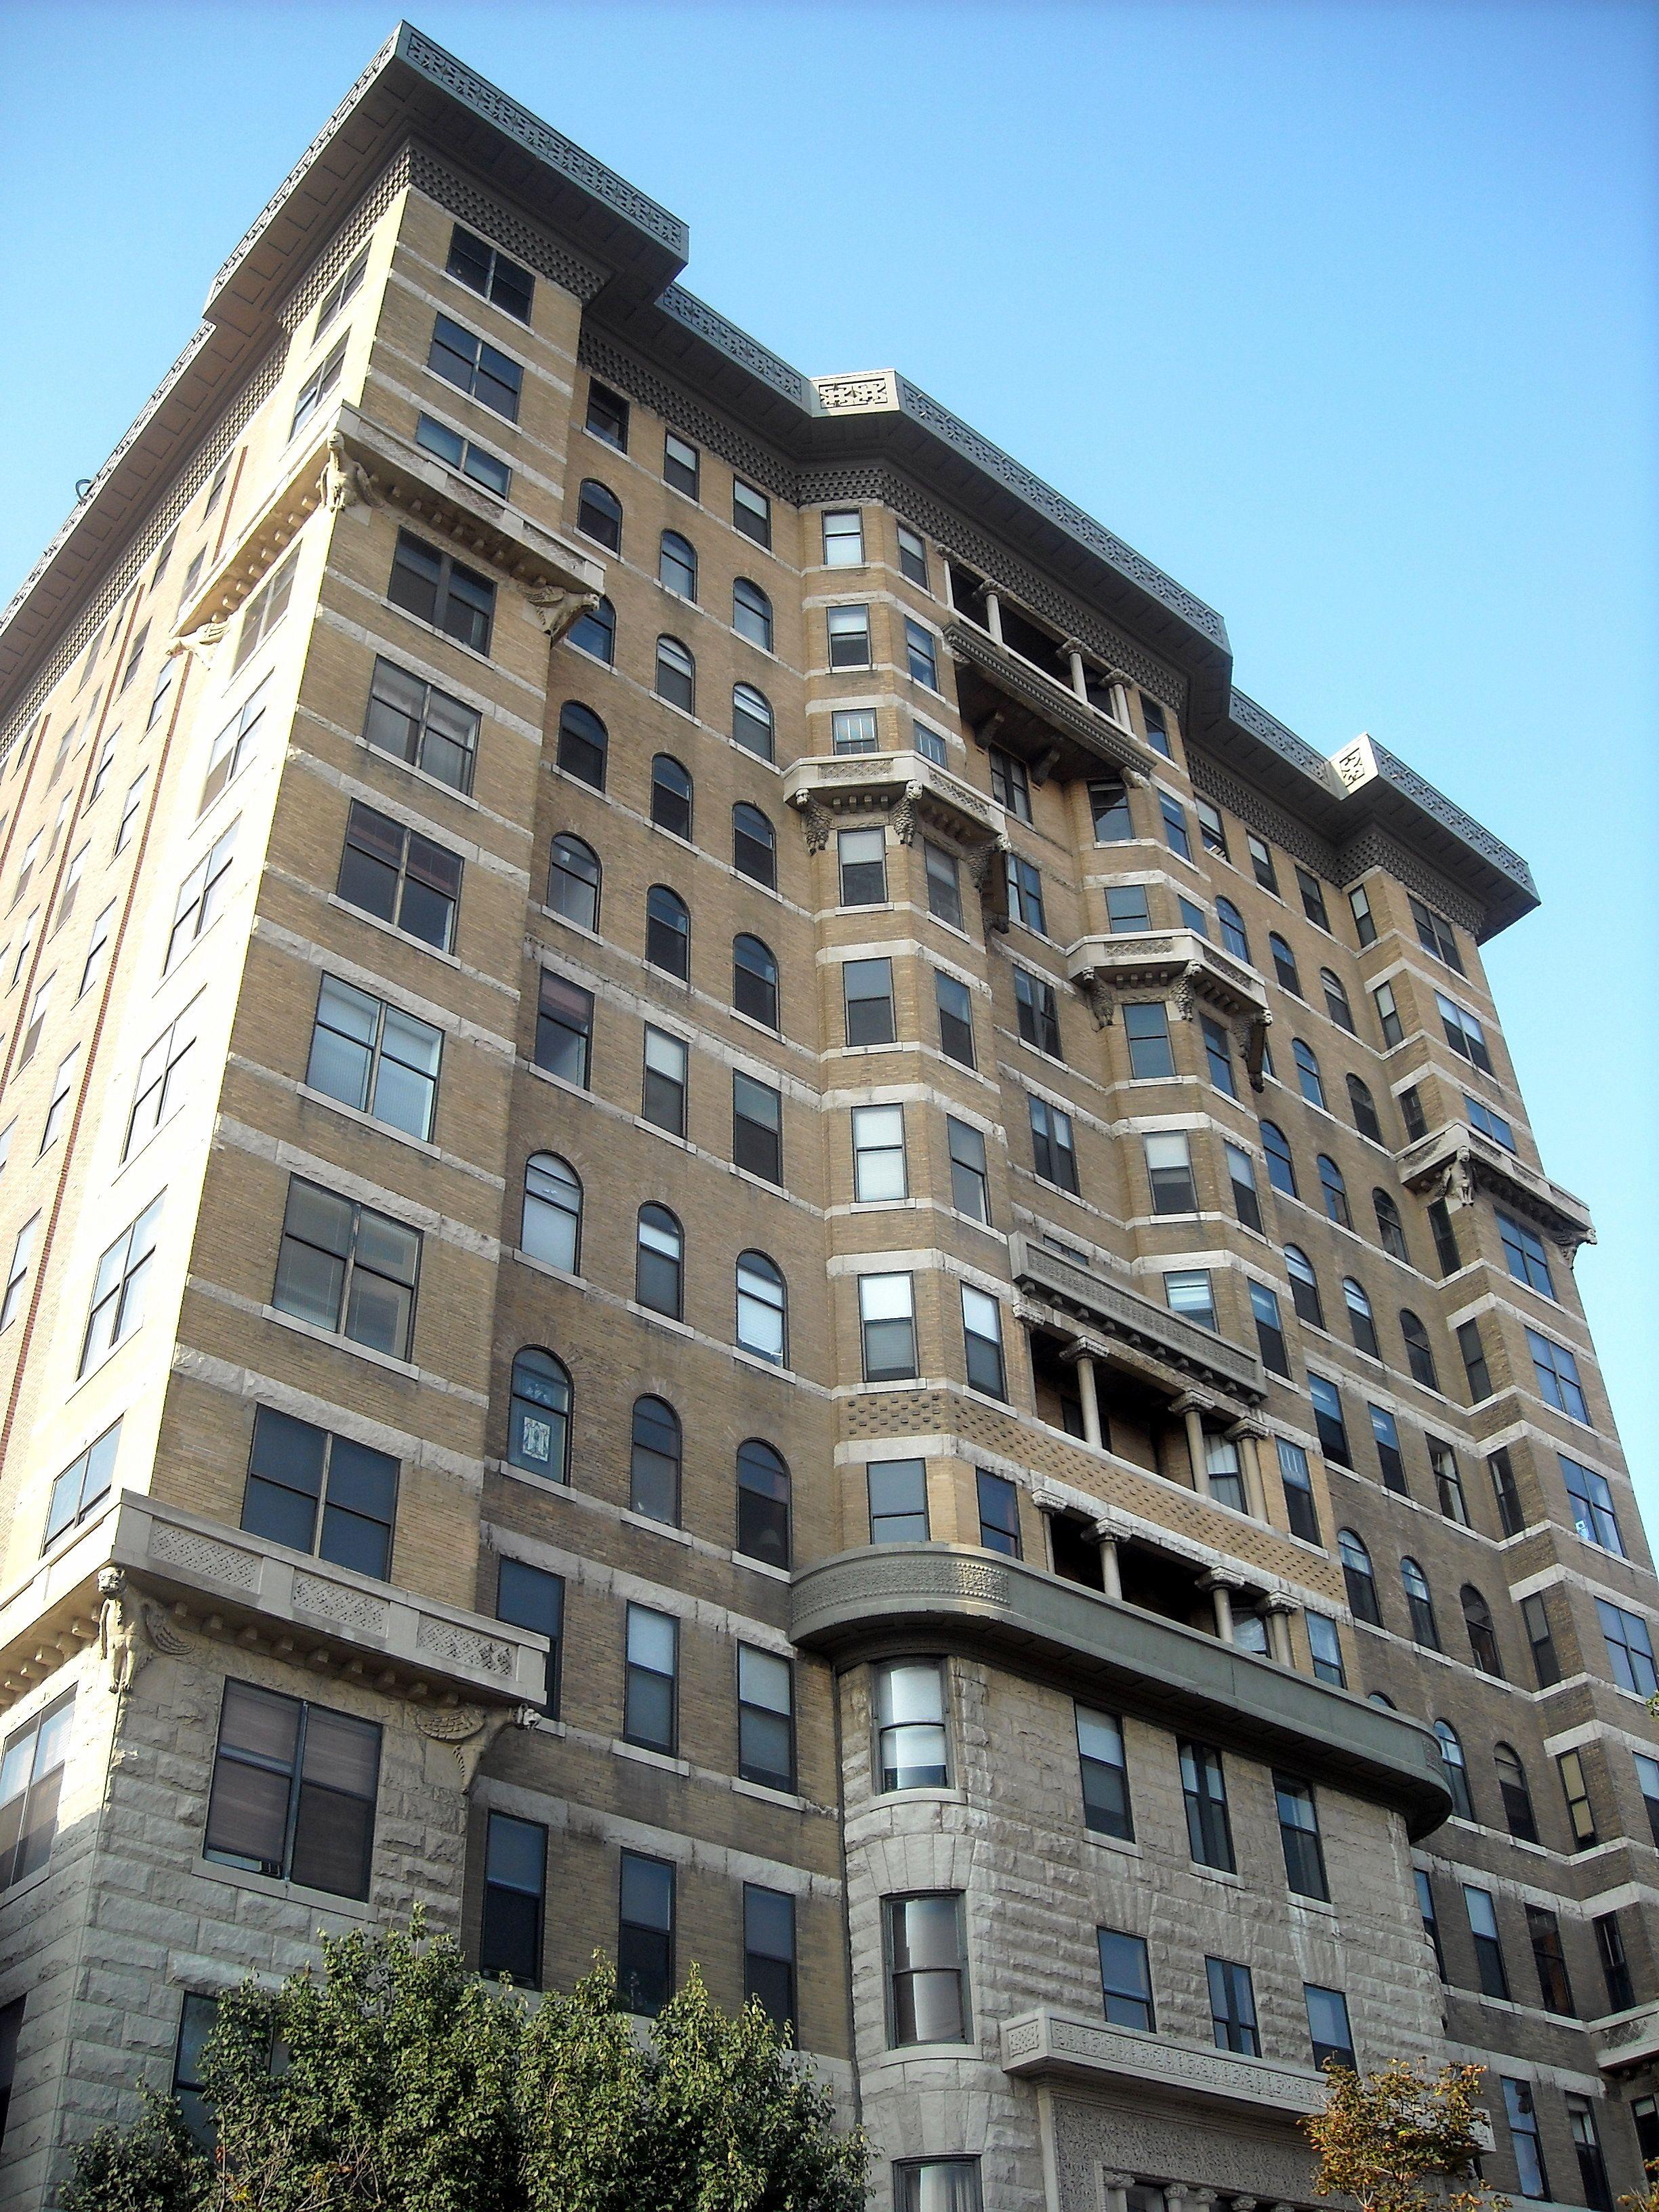 Proper Apartment Management Includes Effective Plumbing Services Washington Dc Cairo Hand Warmers